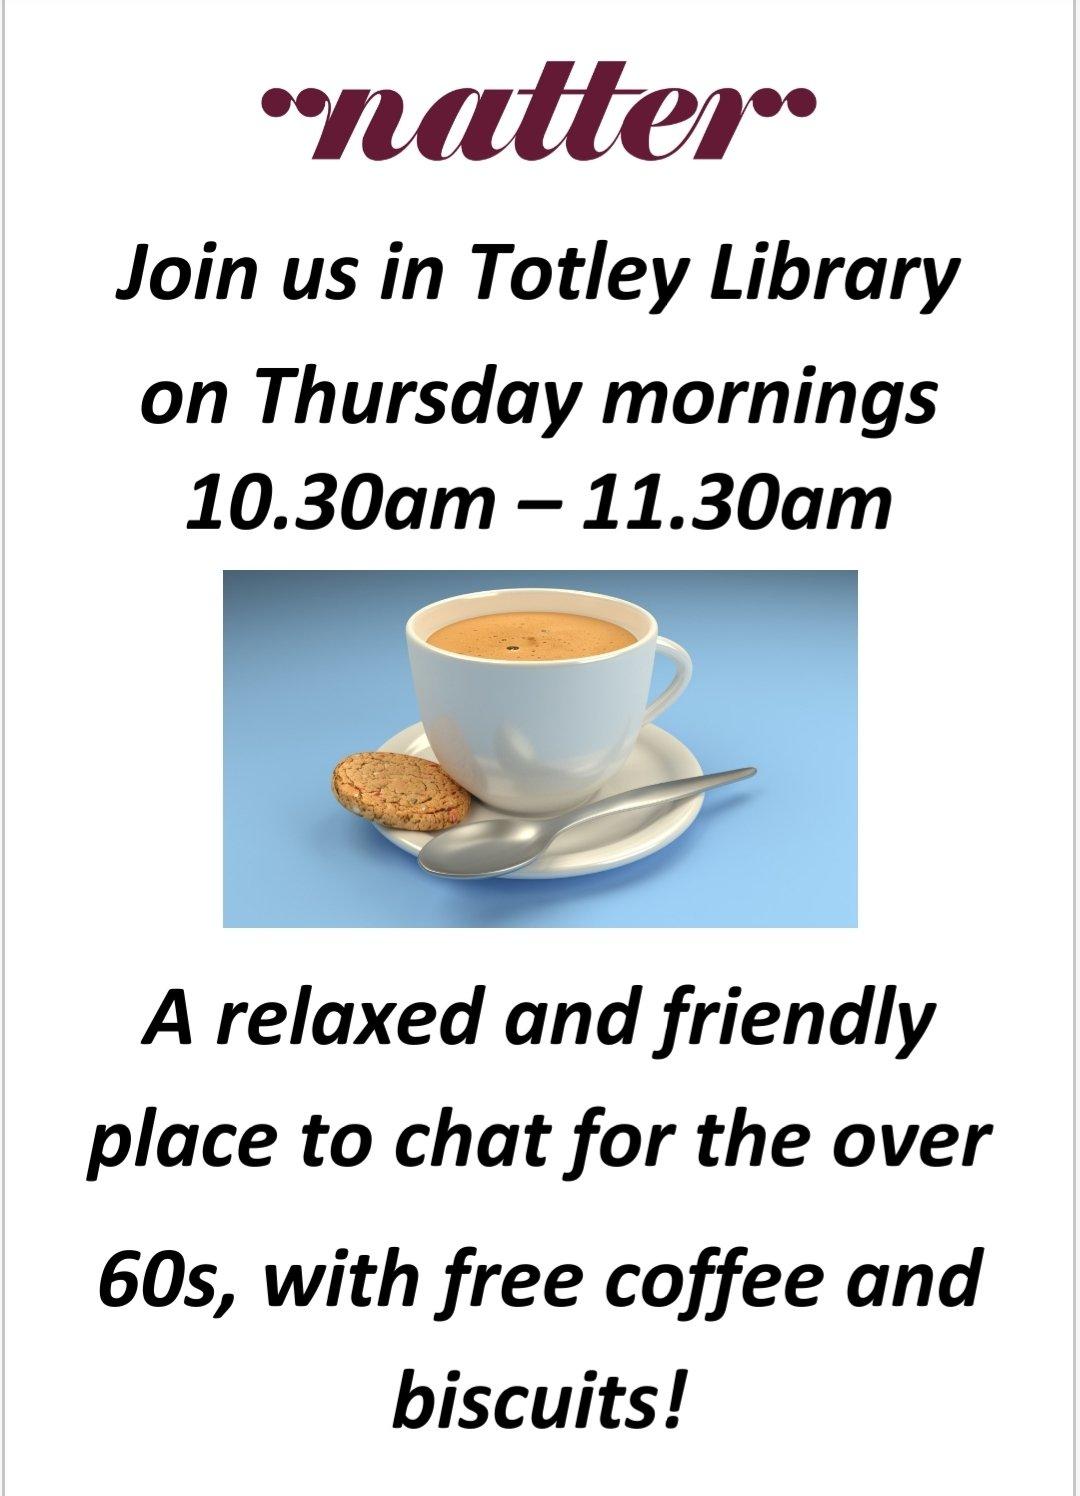 Natter at Totley Library